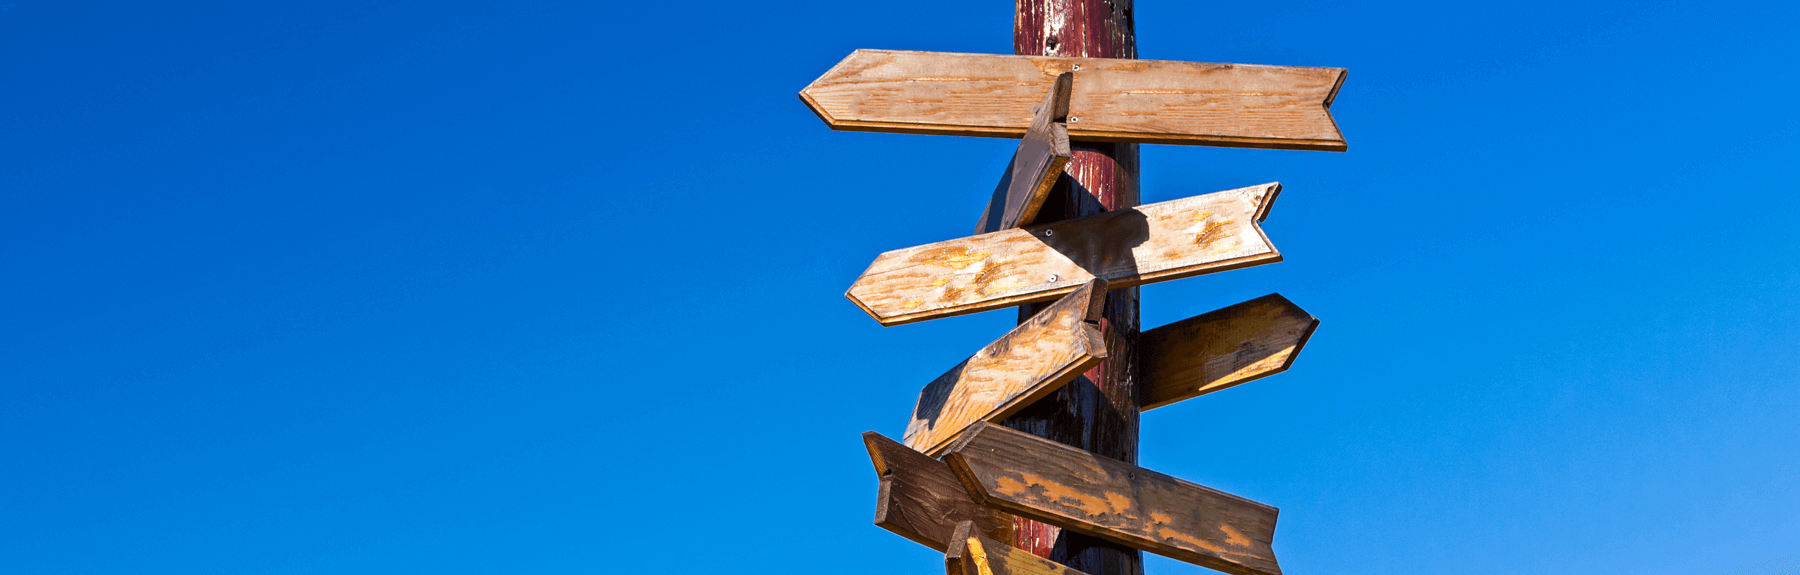 navigation-menu-prototyping-ui-patterns-header